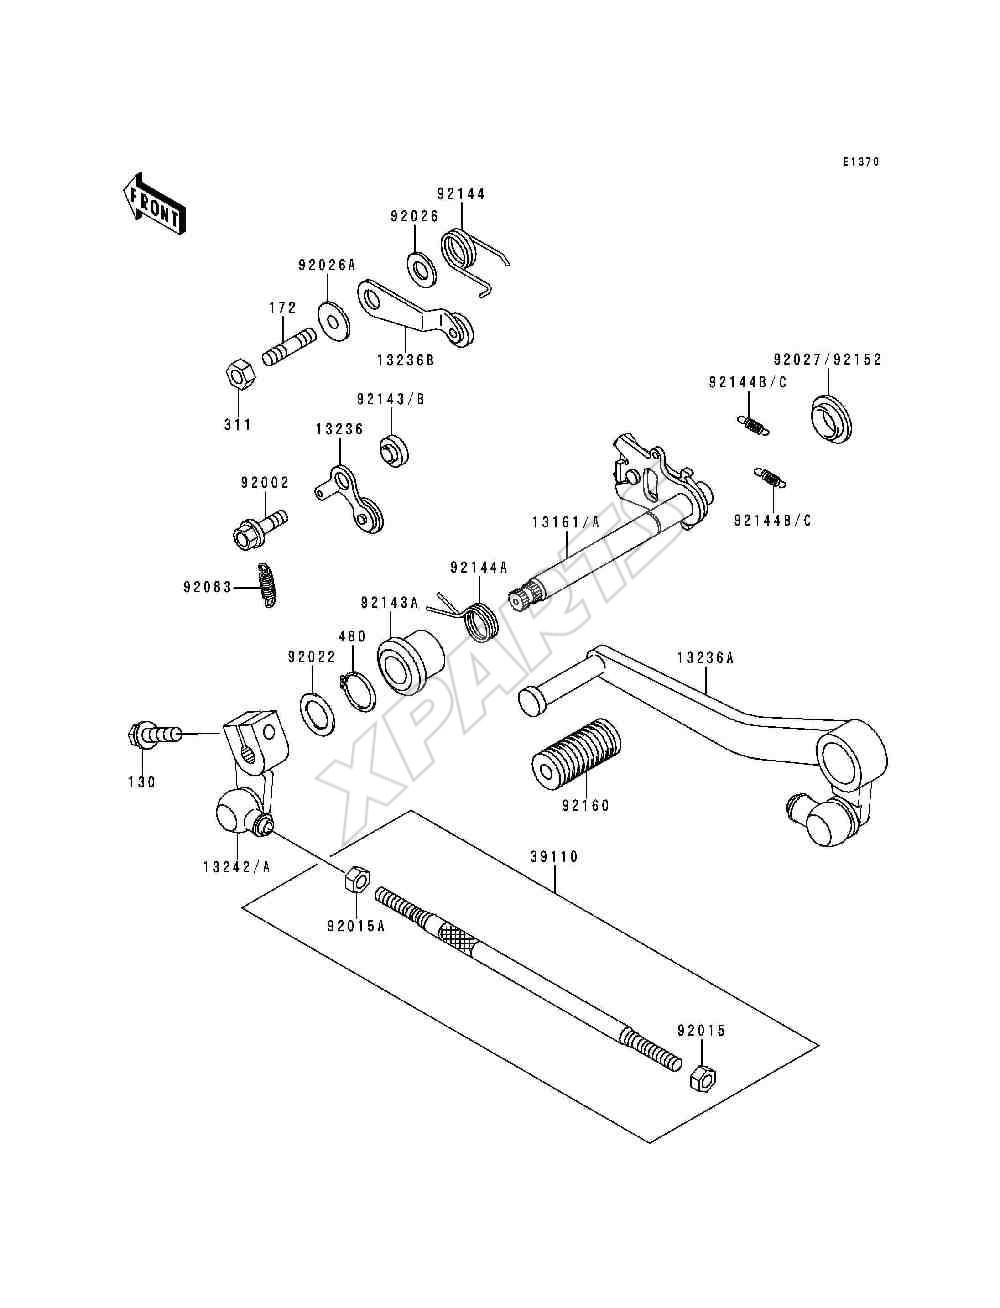 Kawasaki Ninja ZX-9R (ZX900-B1) Gear Change Mechanism